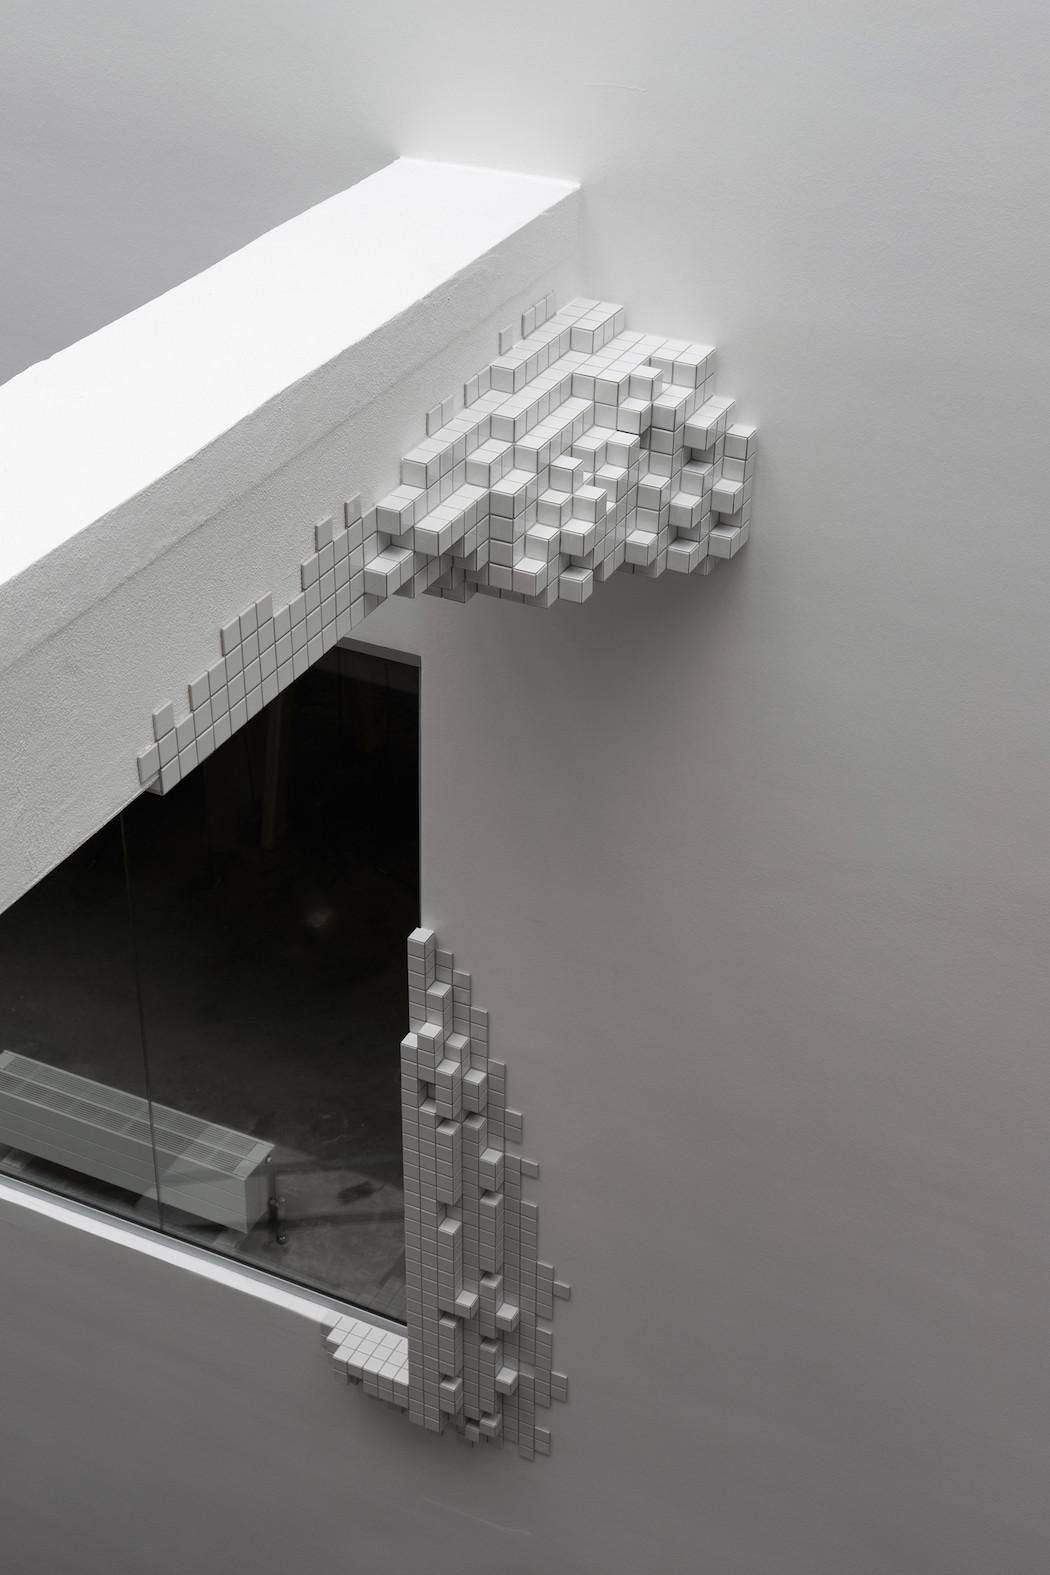 art_borgmannlenk_mos_installation_09-1050x1575